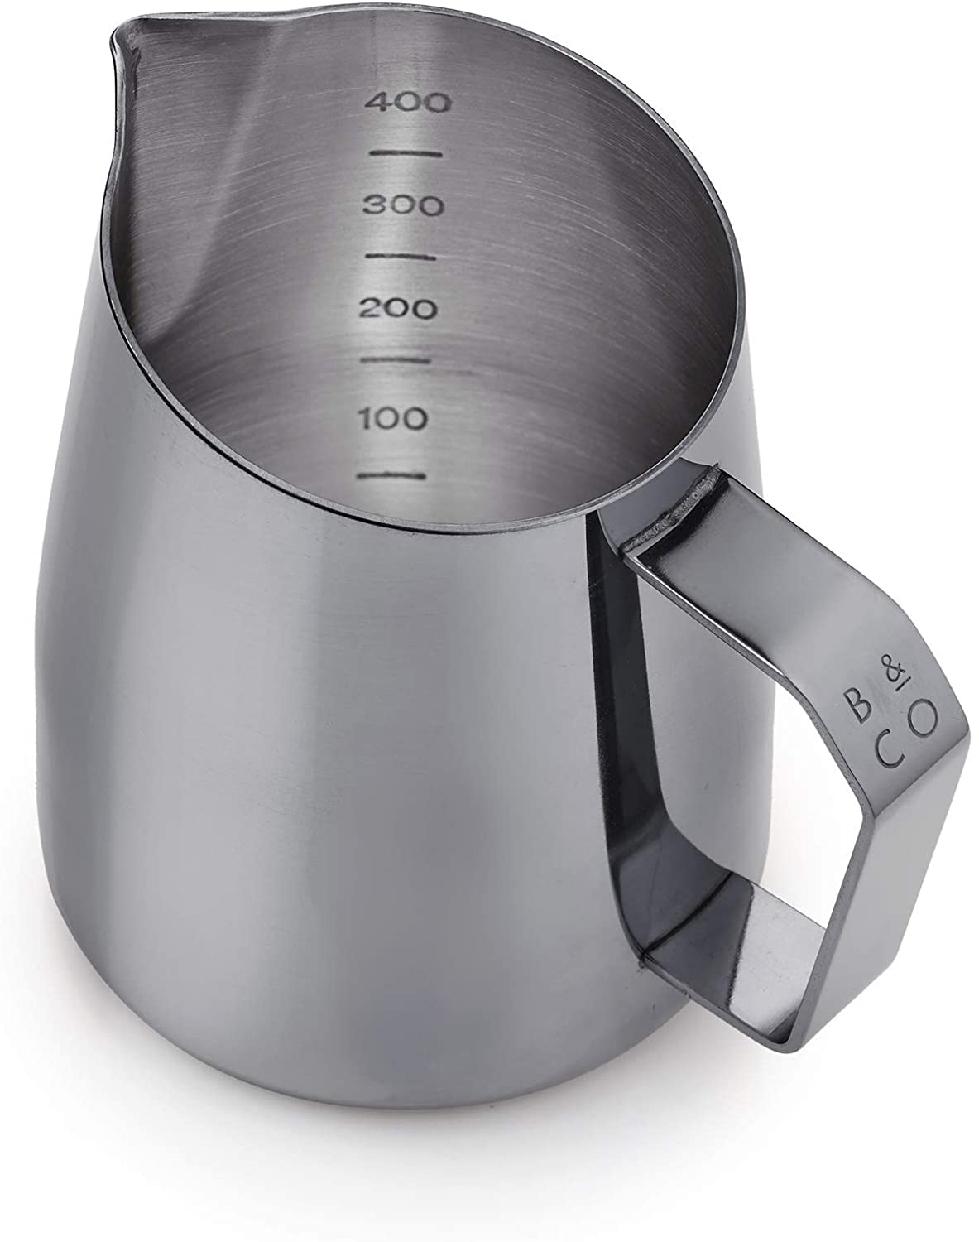 Barista&Co(バリスタアンドコー)Dial In Milk Pitcher 420ml Blackの商品画像2